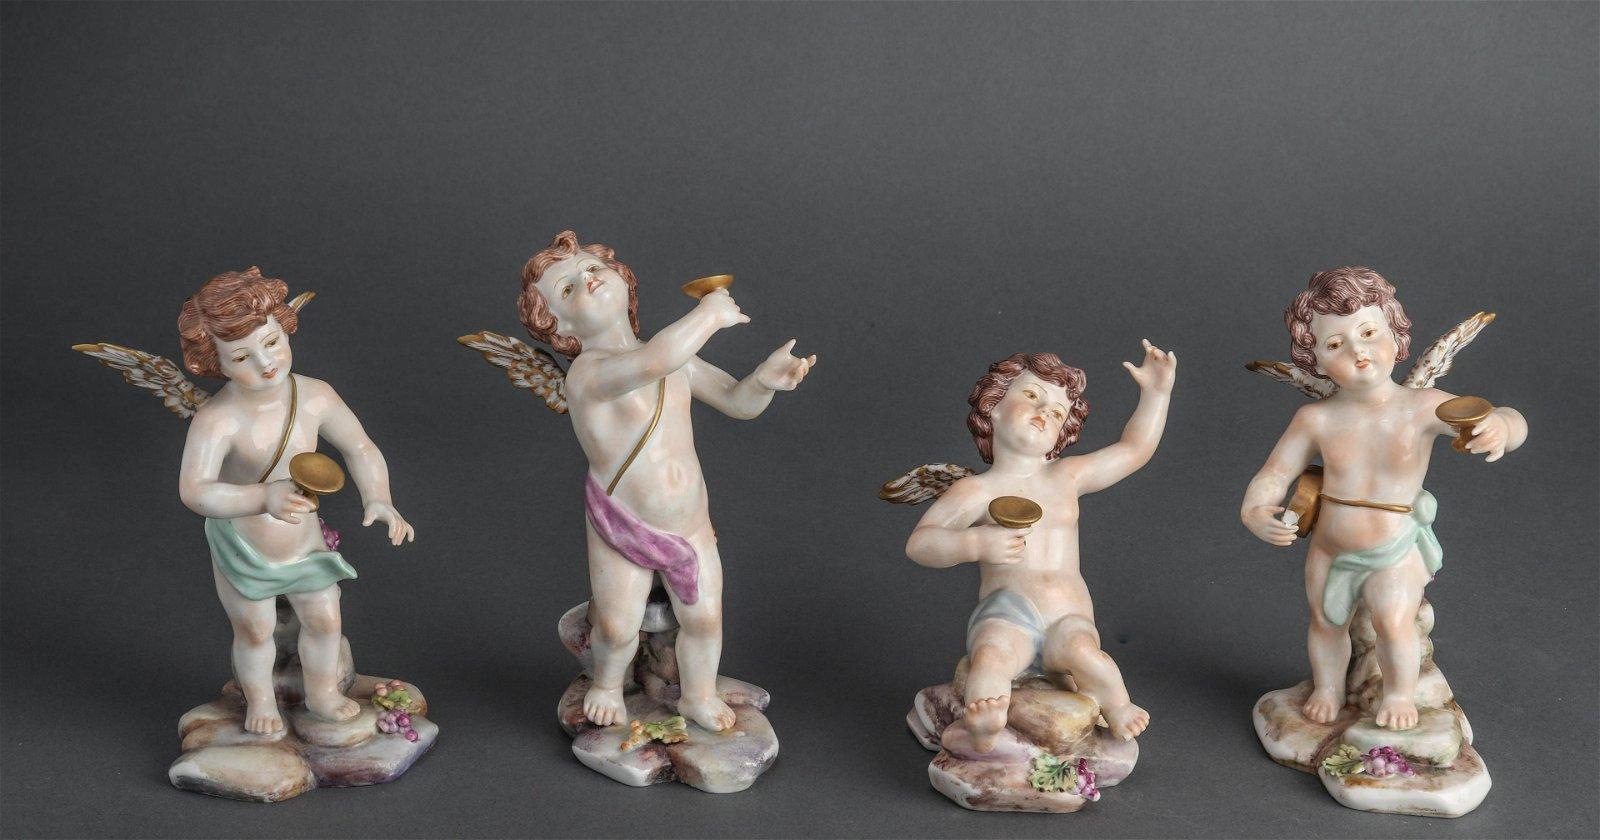 Italian Porcelain Figural Sculptures, 4